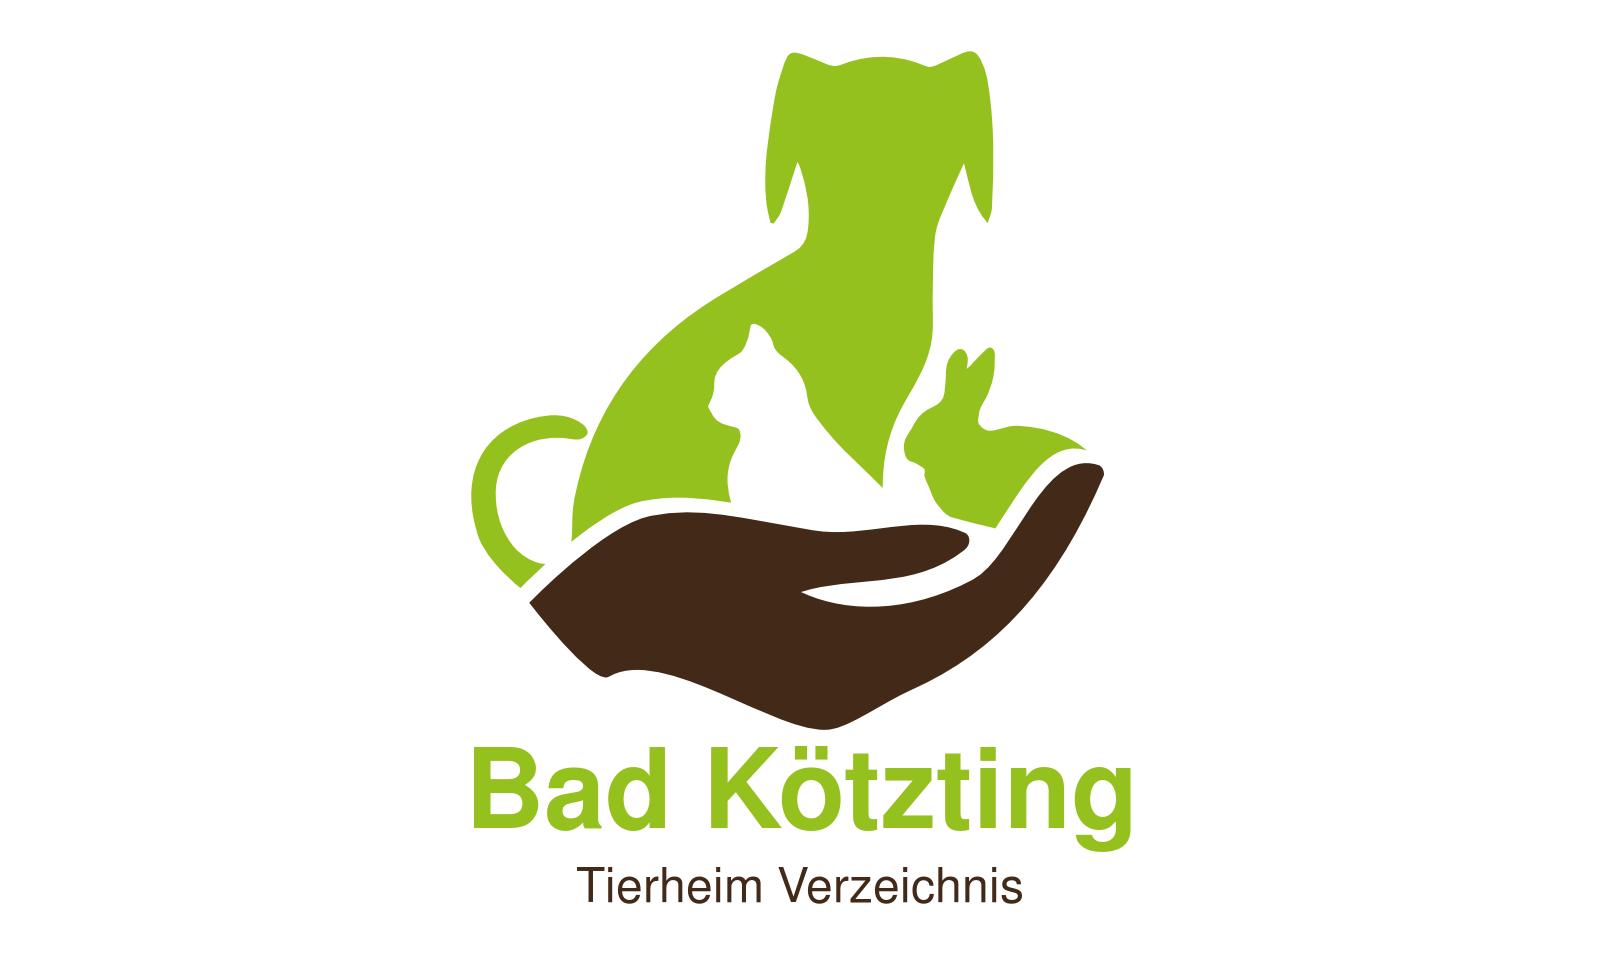 Tierheim Bad Kötzting